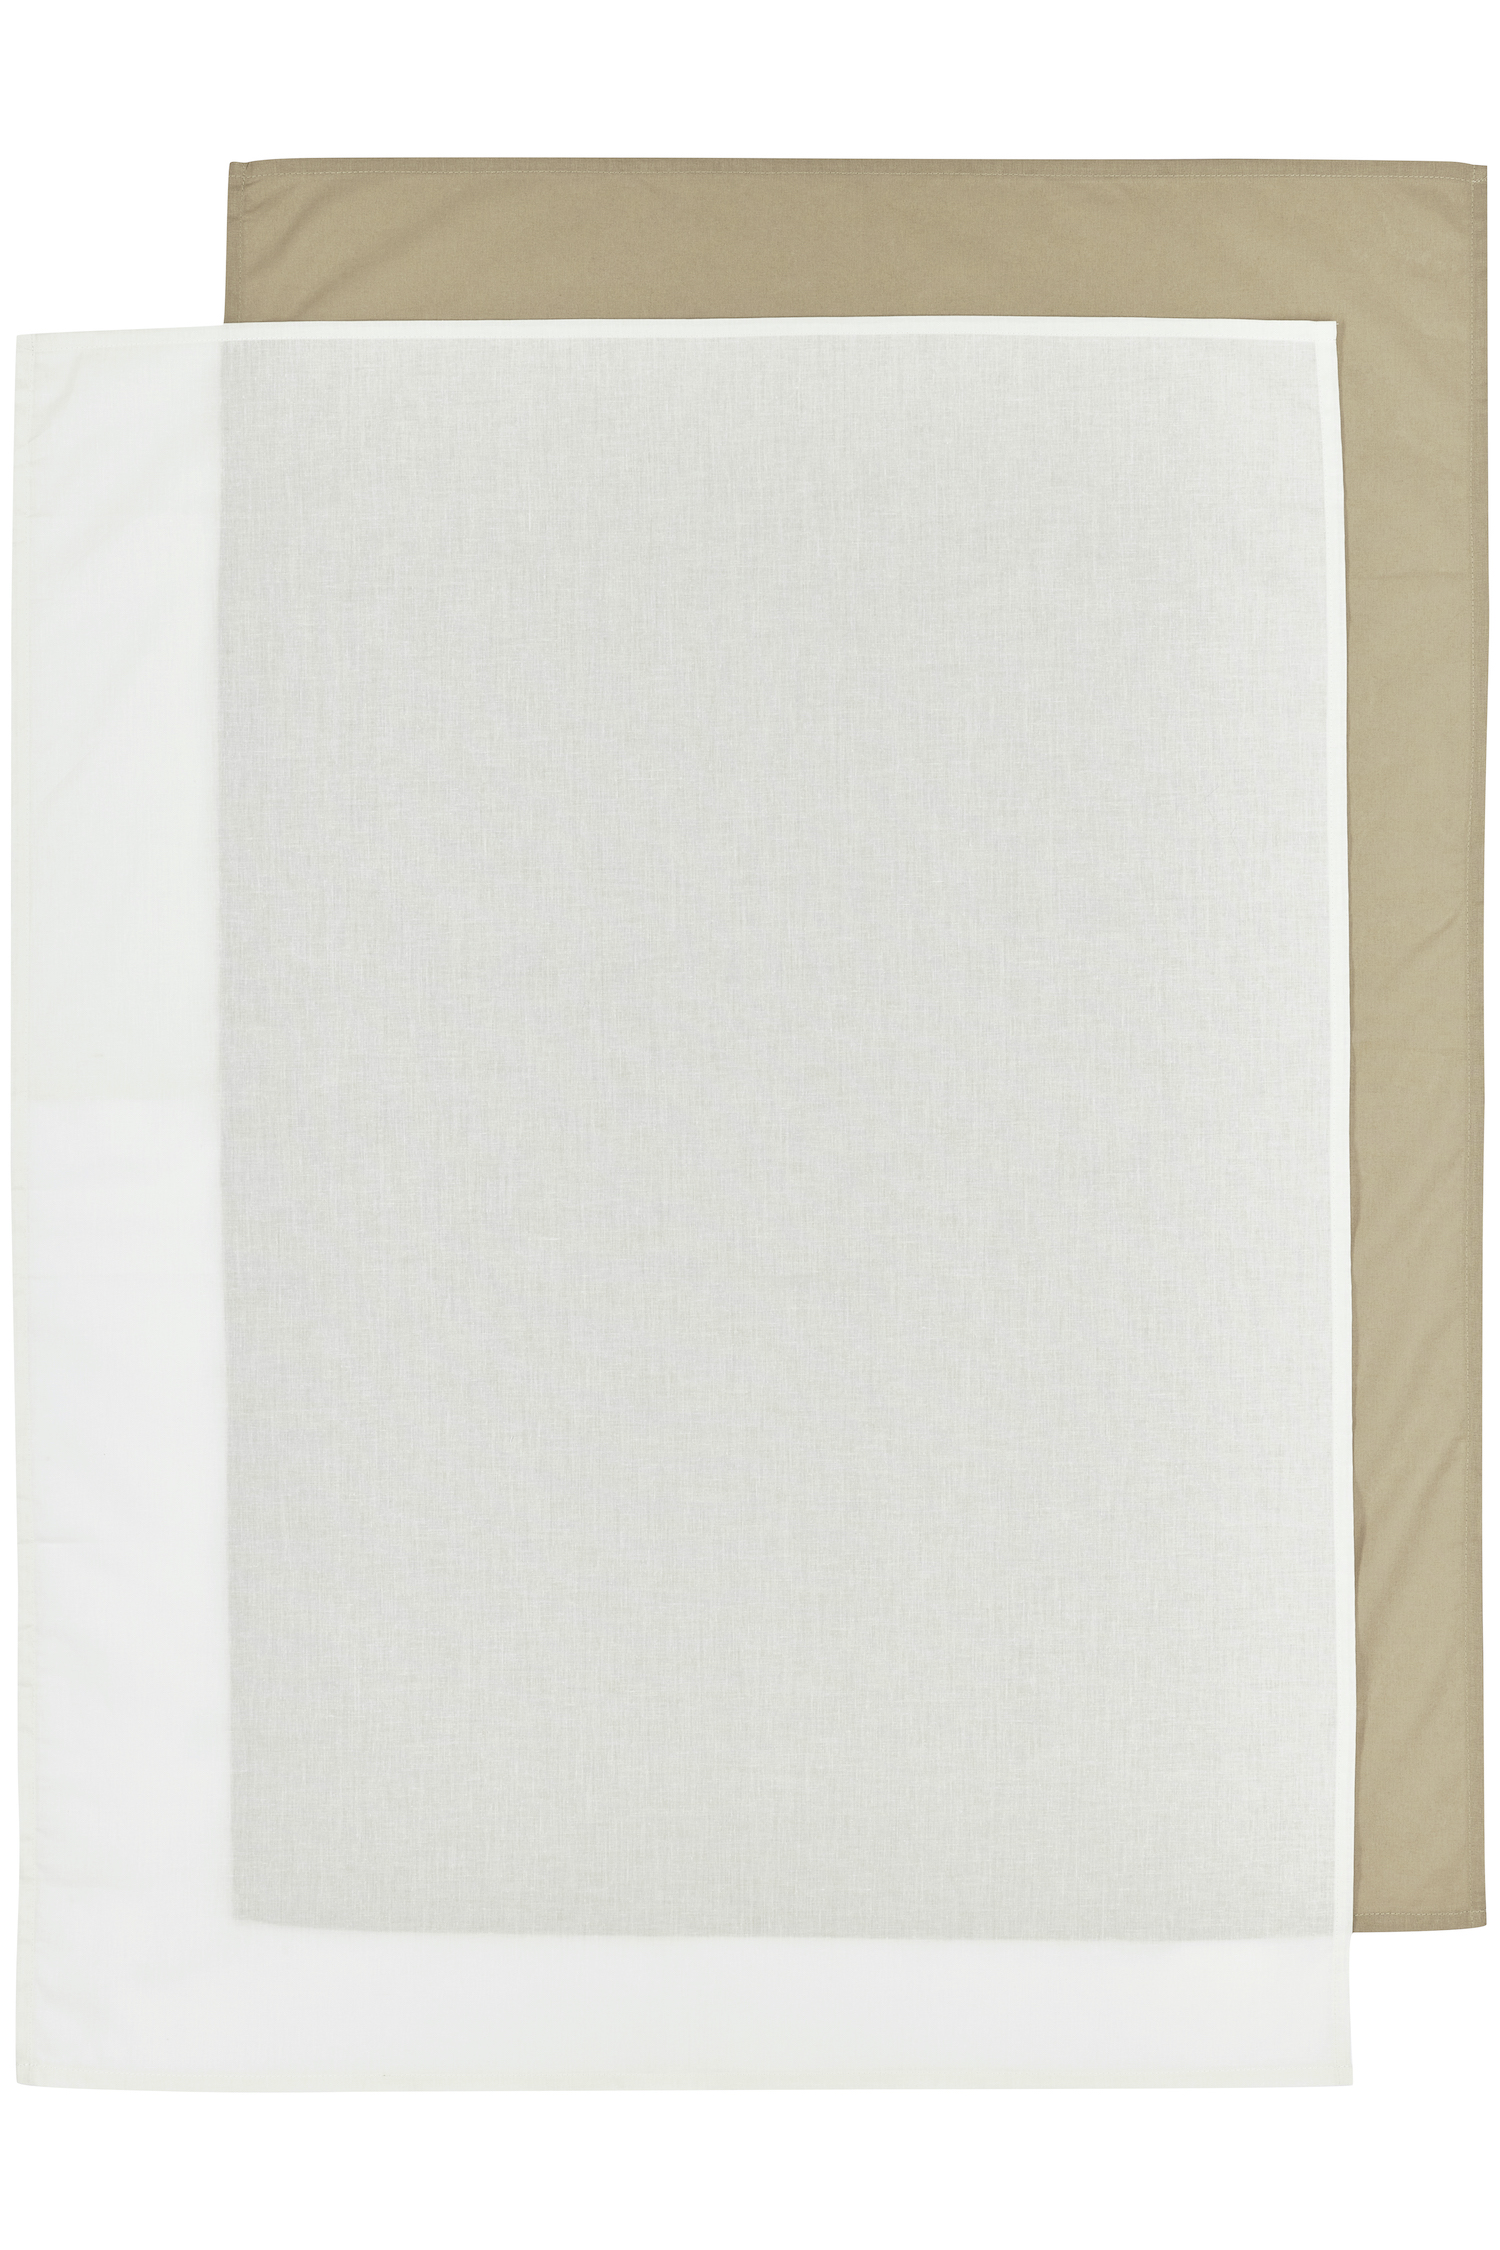 Bettlaken groß 2-Pack Uni - Taupe/Offwhite - 100x150cm